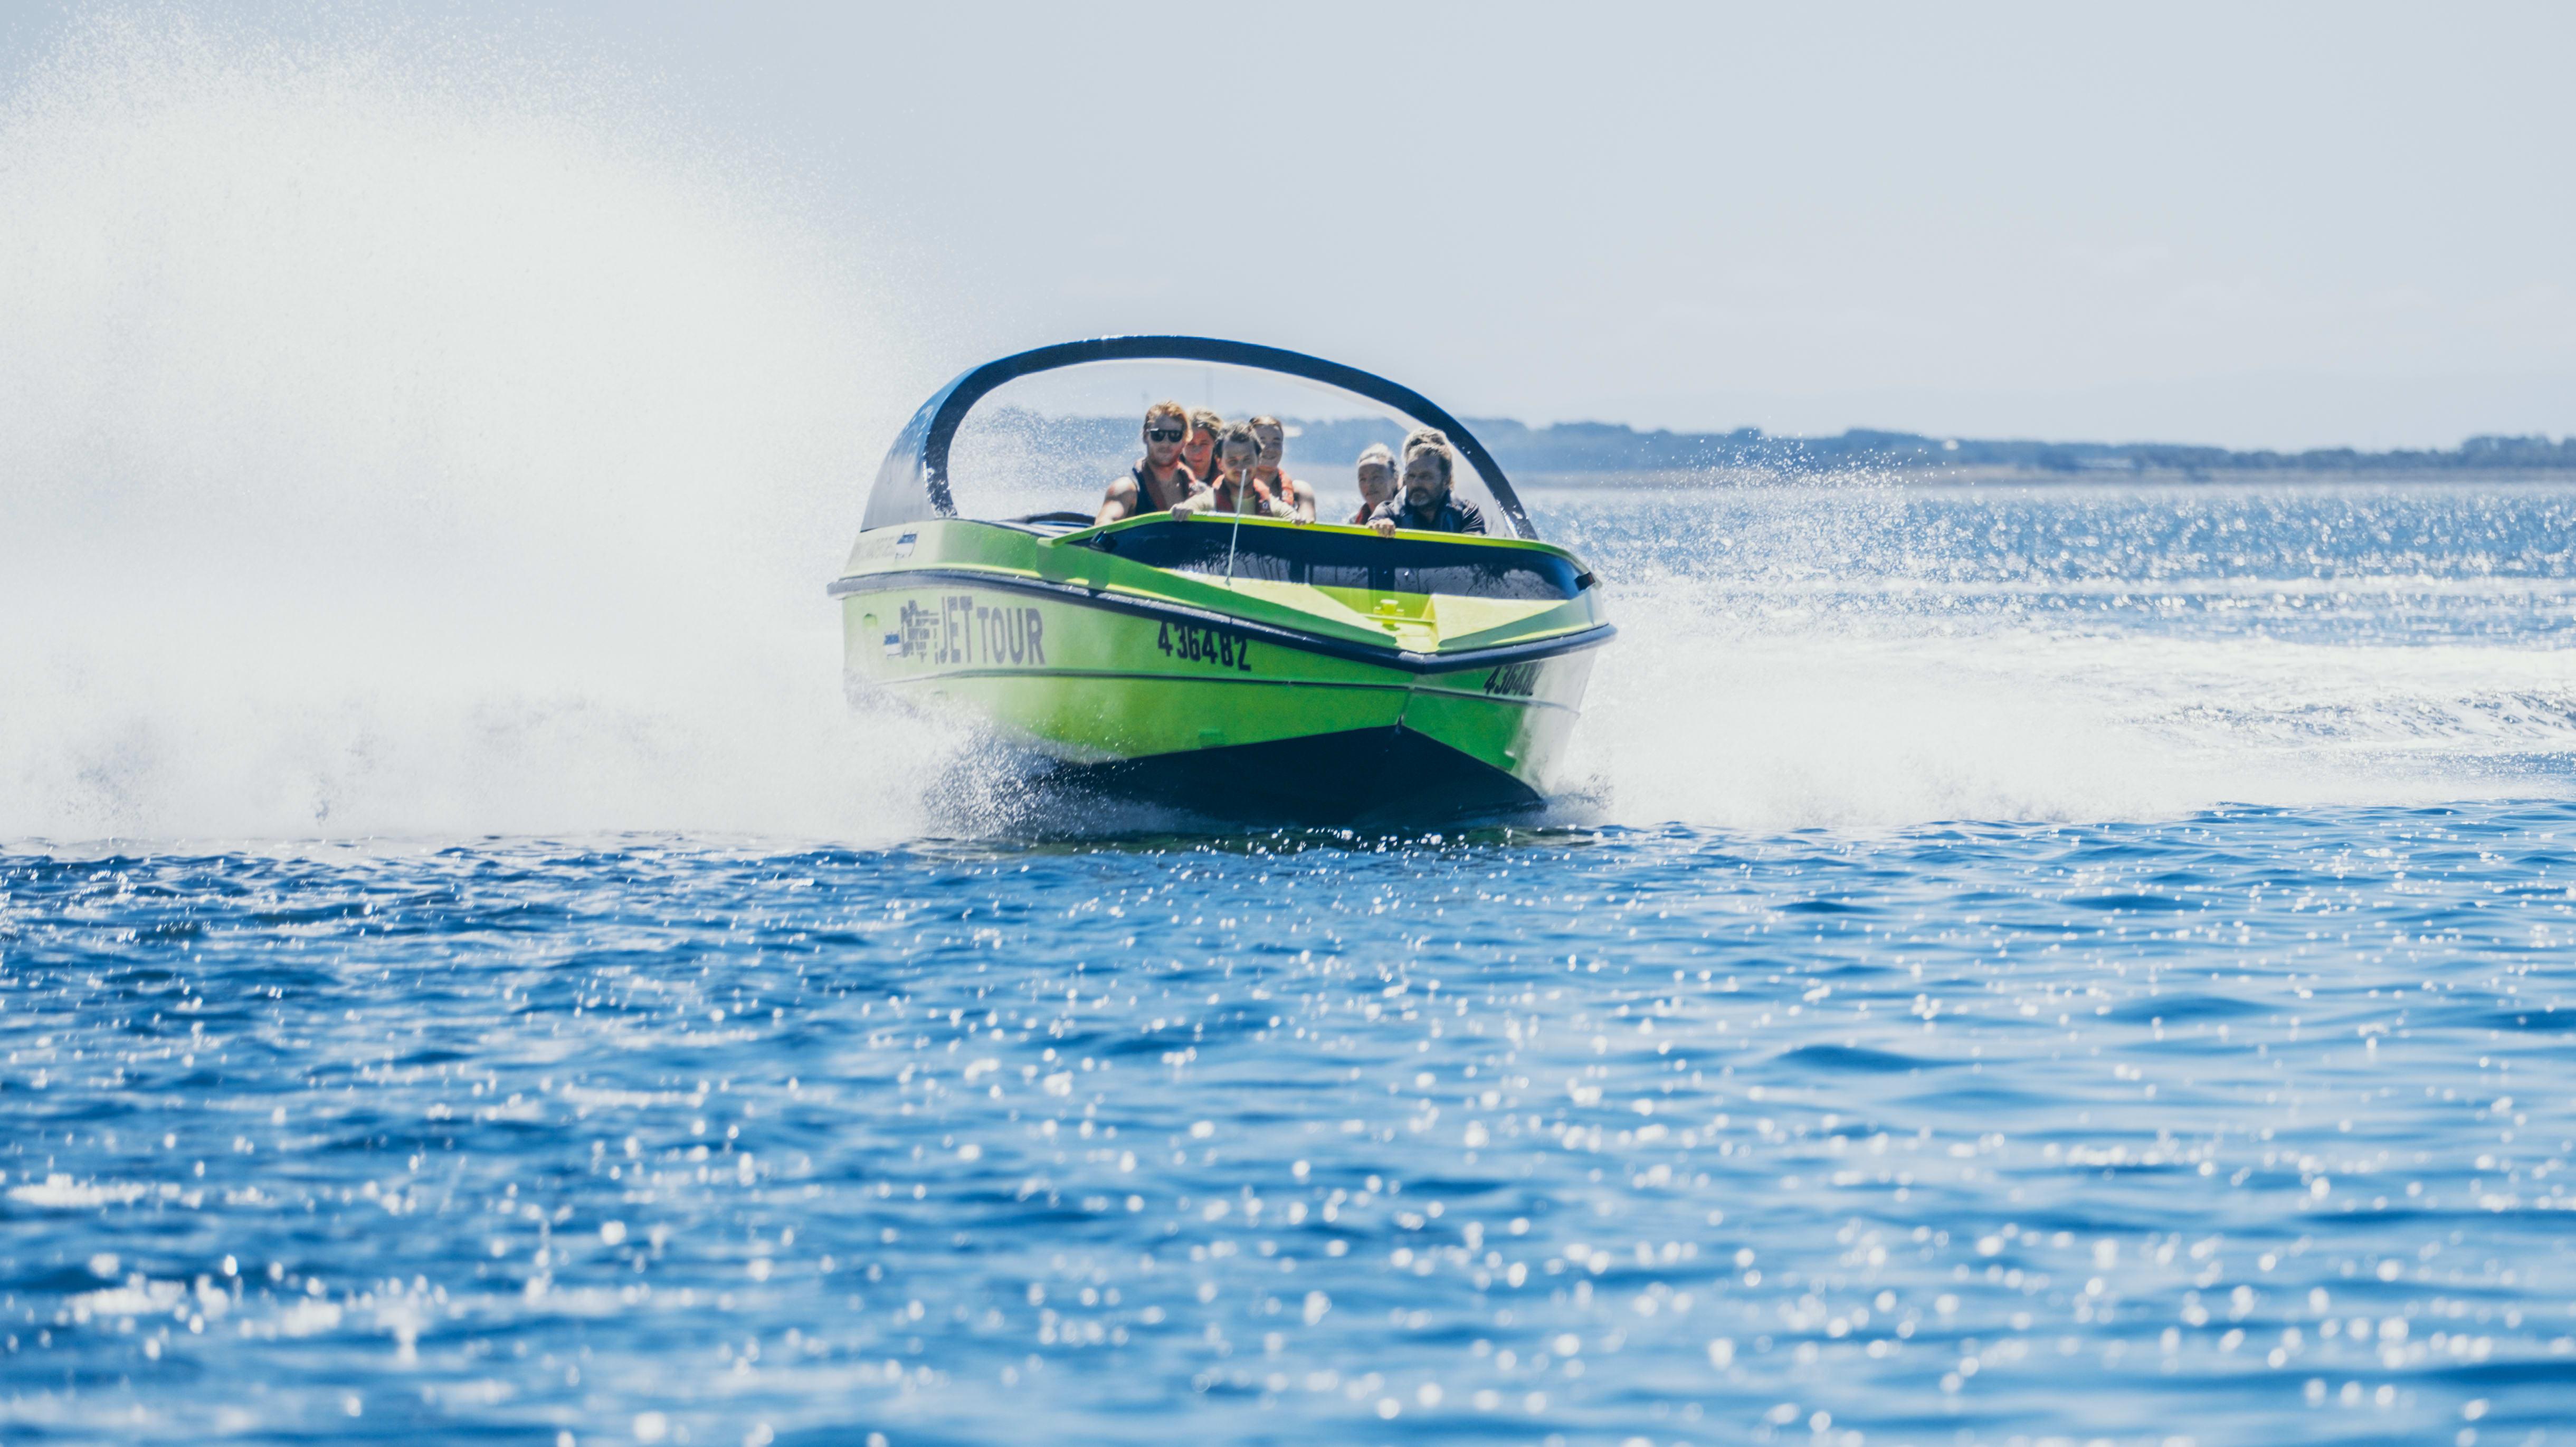 Drift Jet Boat Tour, 35 Minutes - Phillip Island